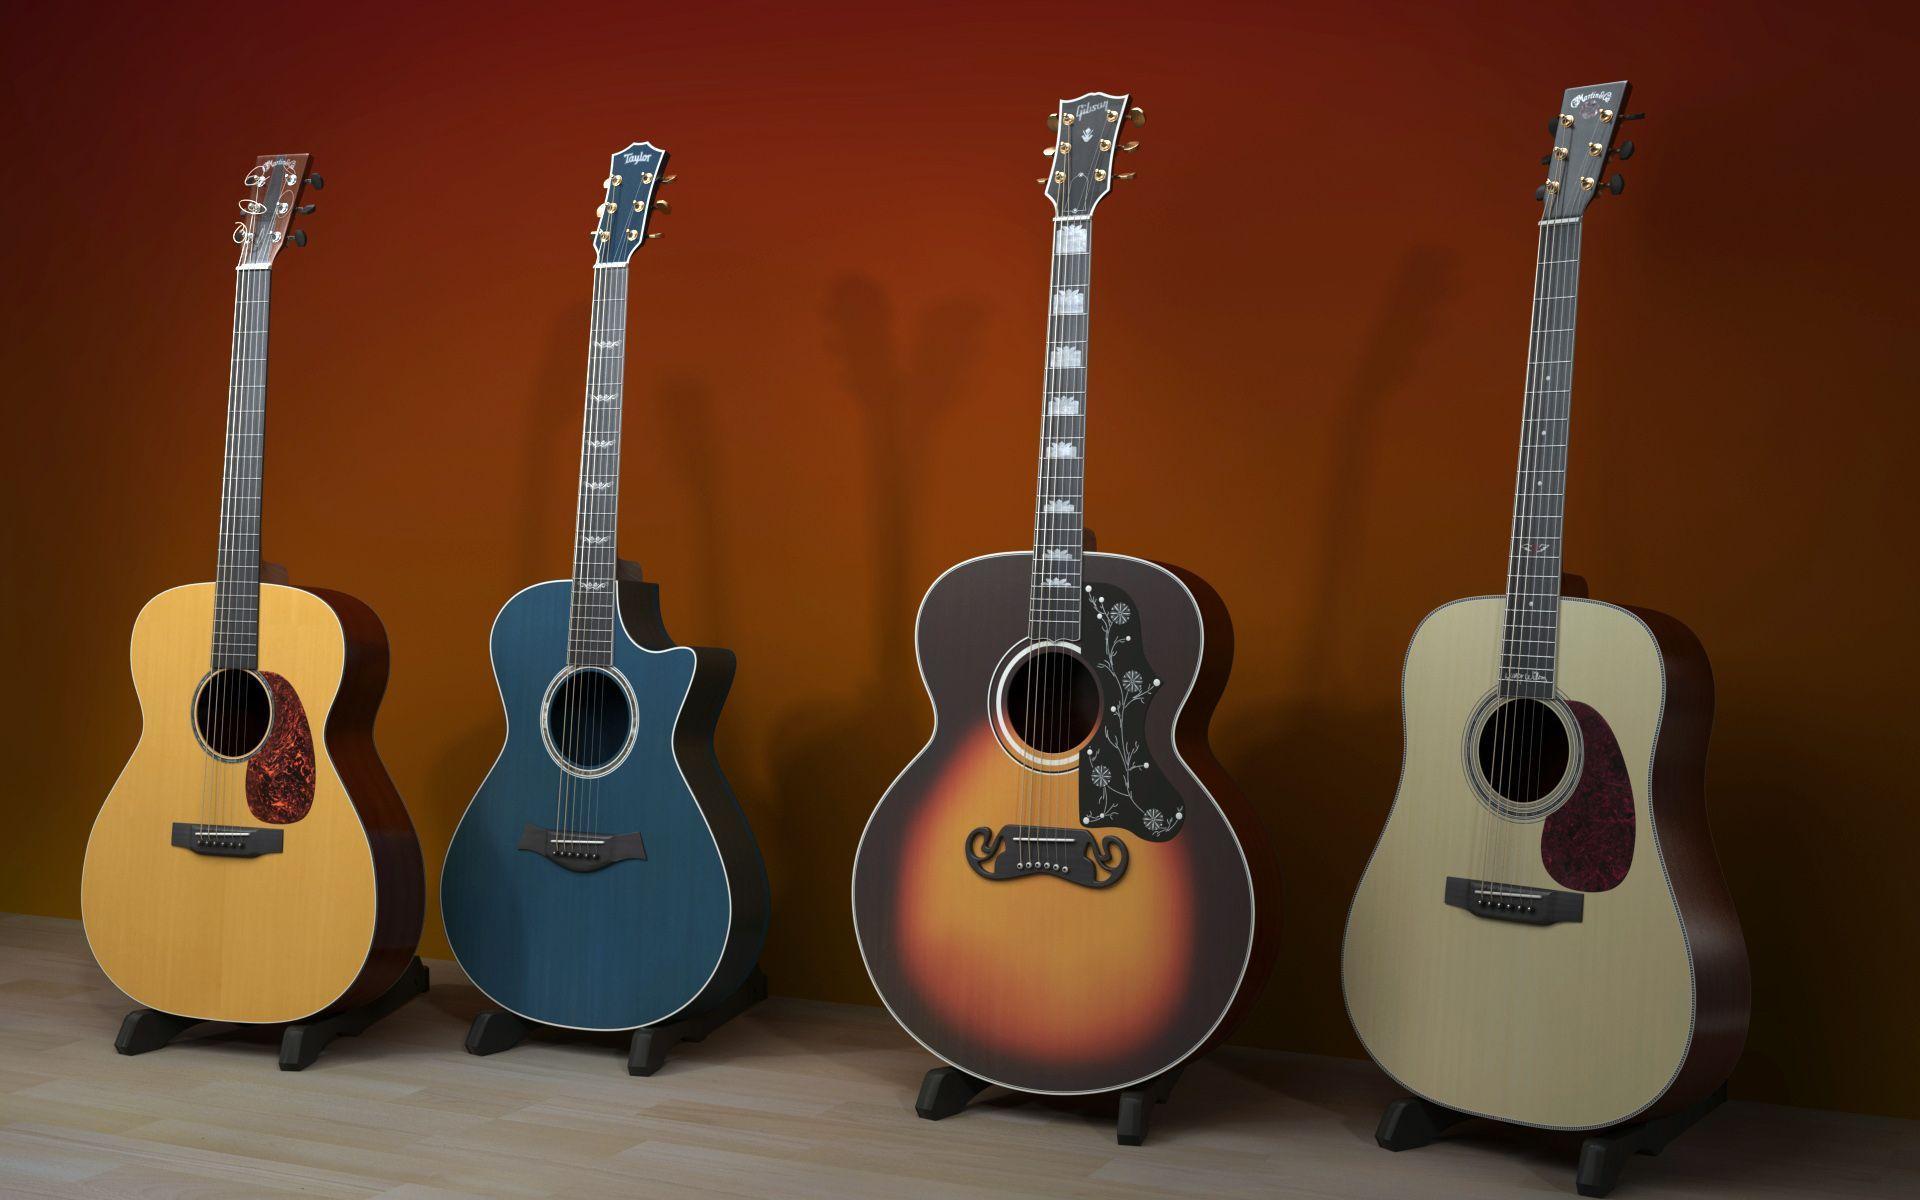 Wallpapers For > Guitar Wallpaper Hd Widescreen